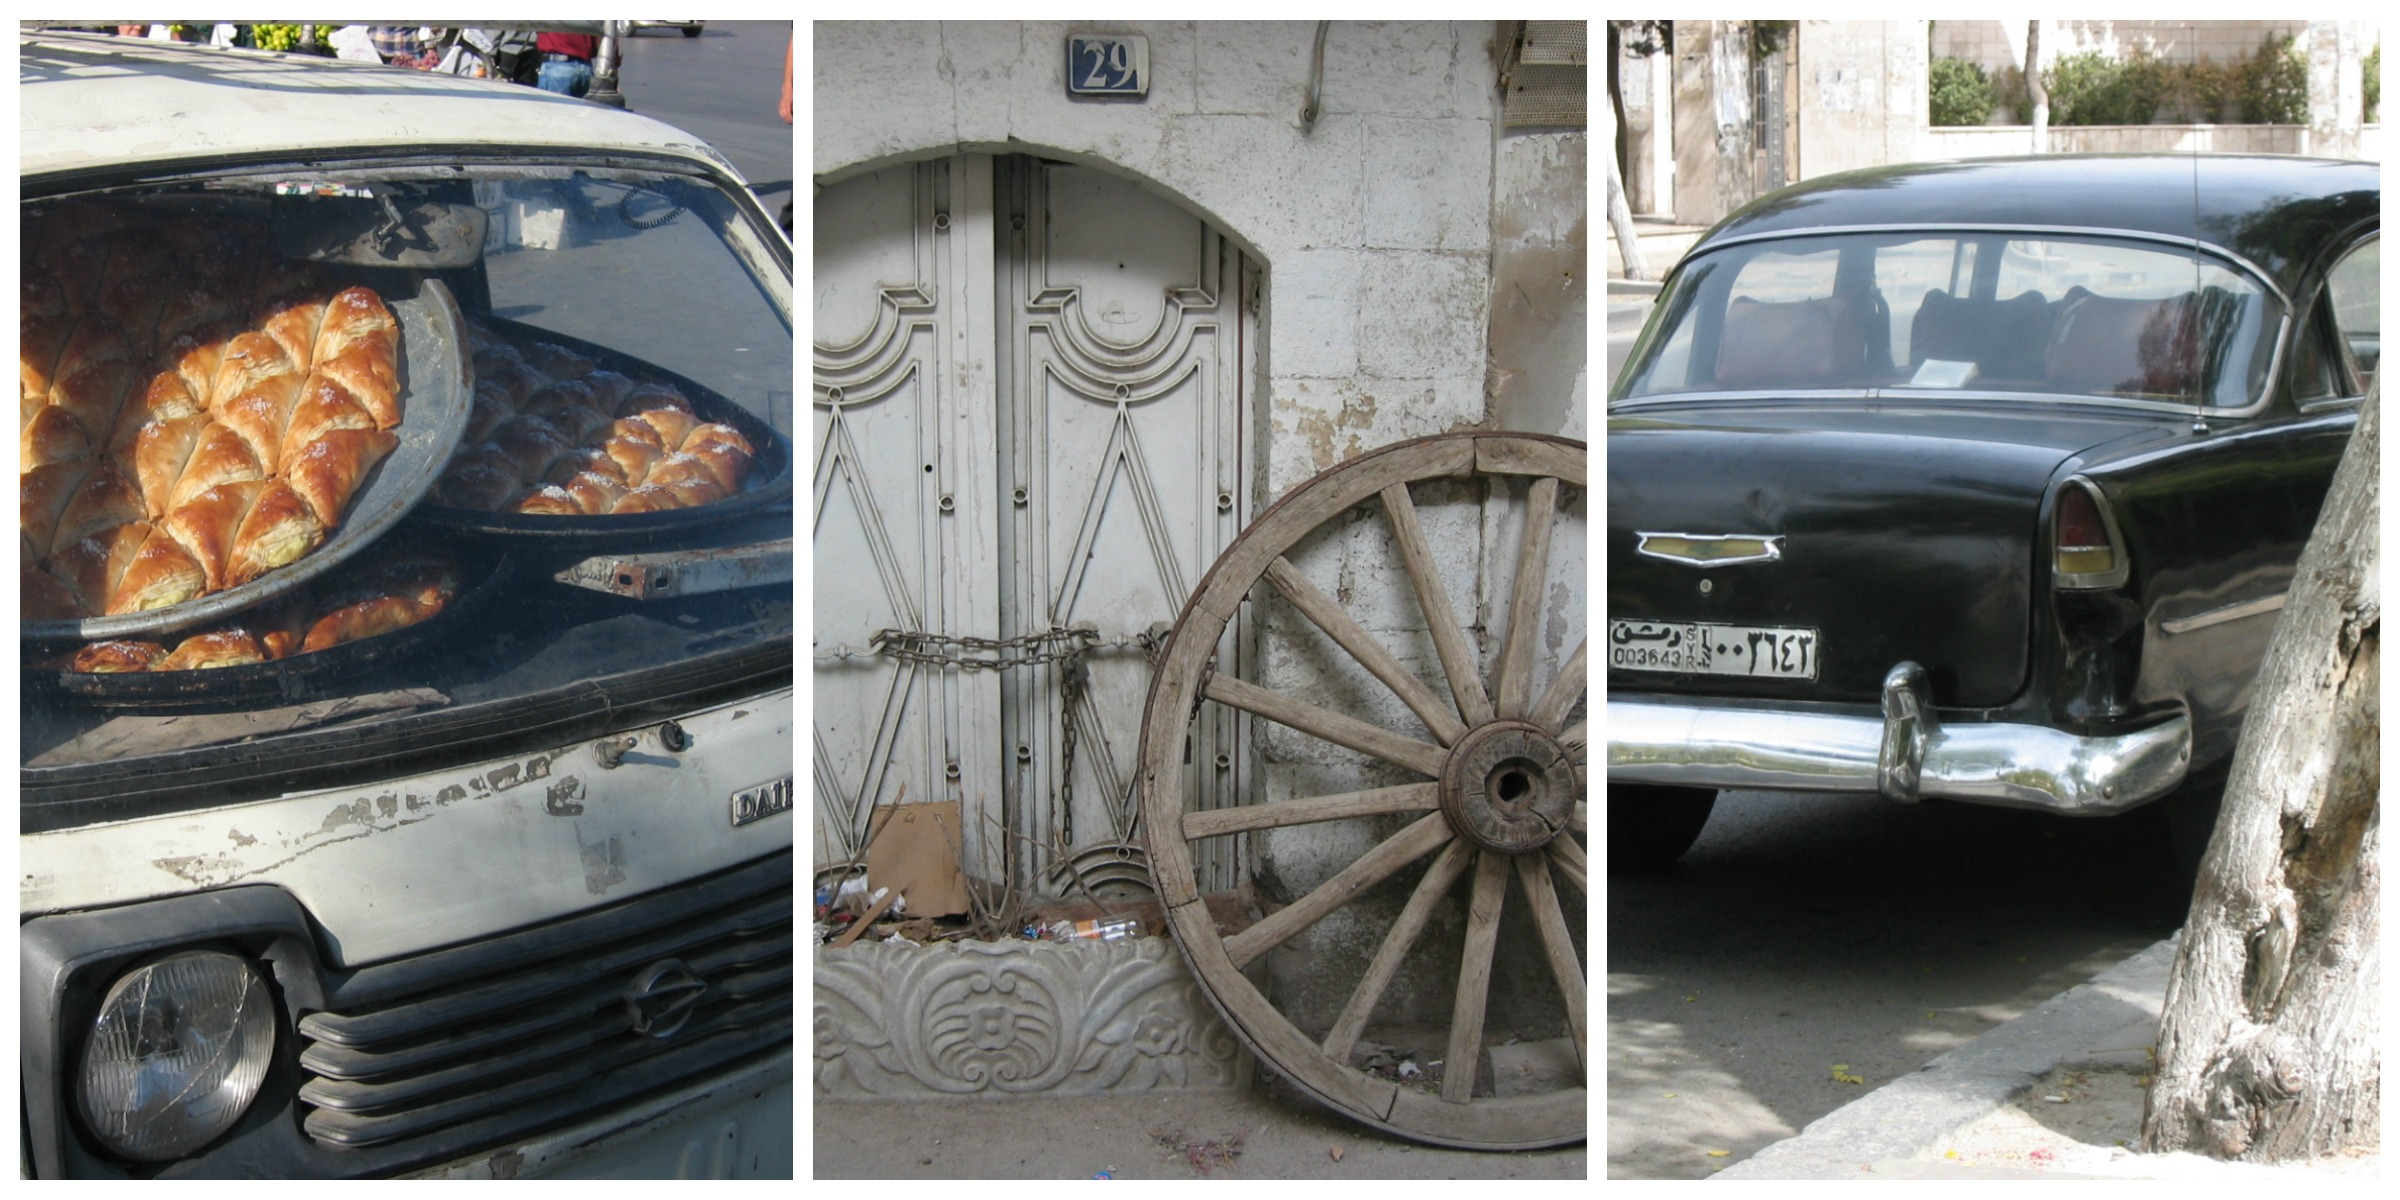 160220_Collage_Damaskus_2